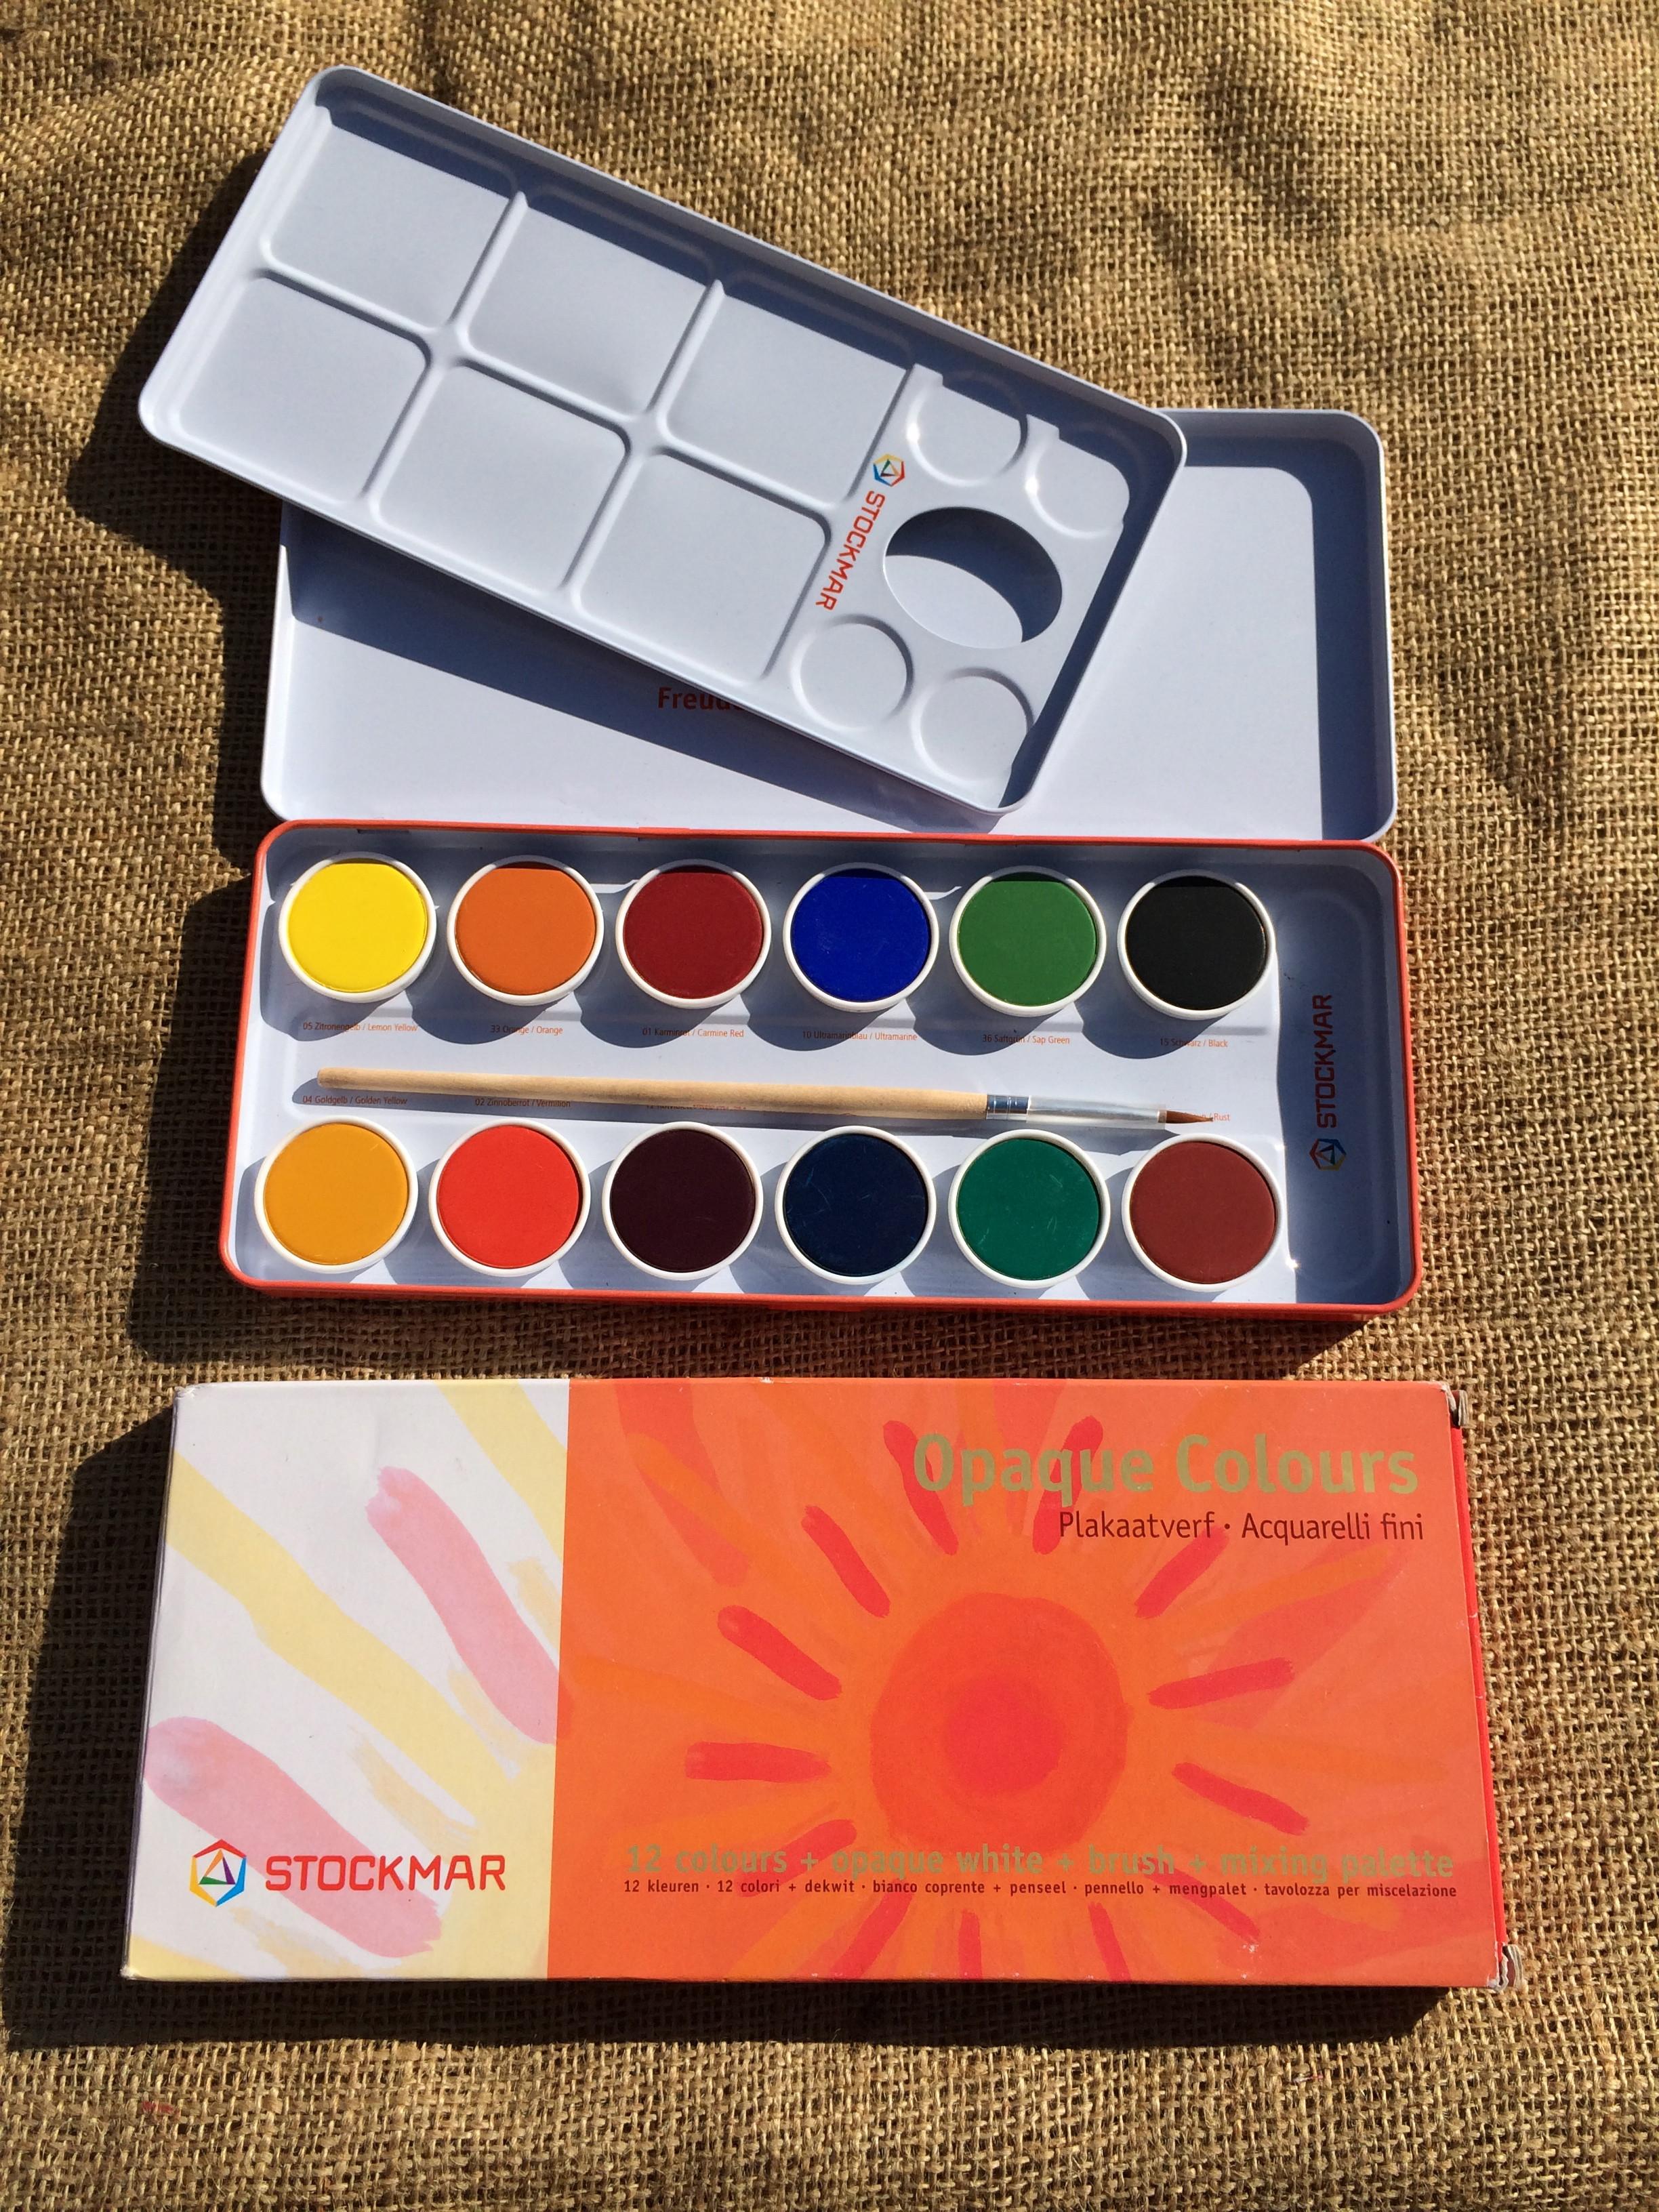 Online waldorf art supplies for kids - Material waldorf ...